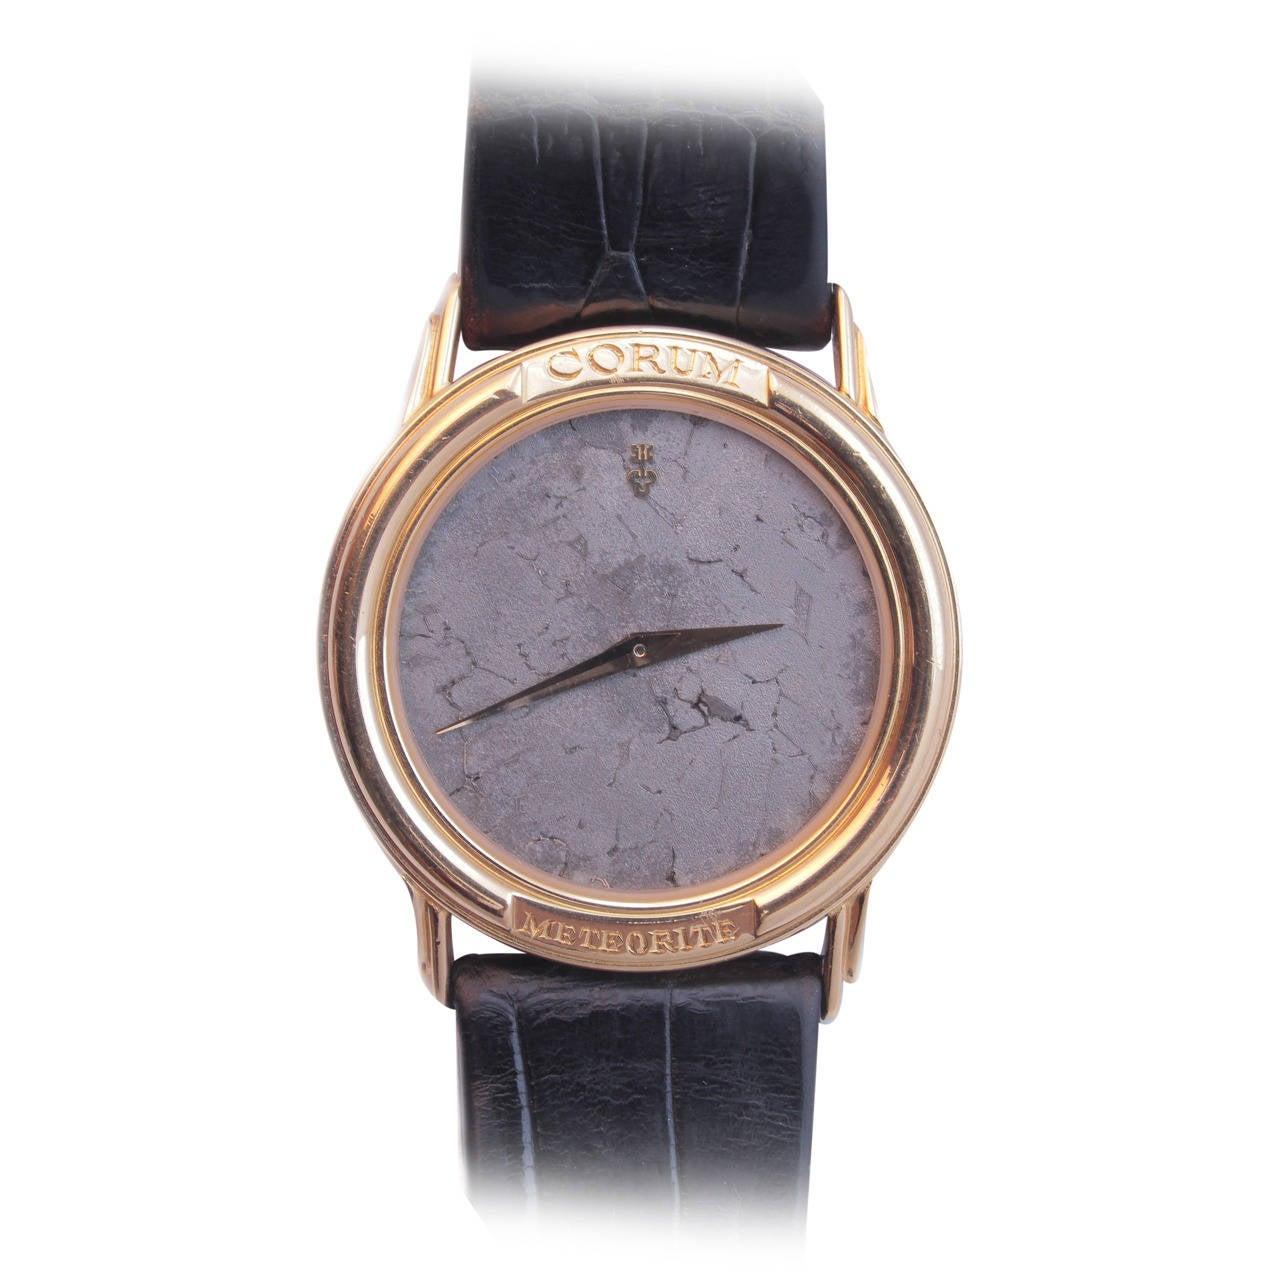 Corum Yellow Gold Wristwatch with Meteorite Dial circa 1990s